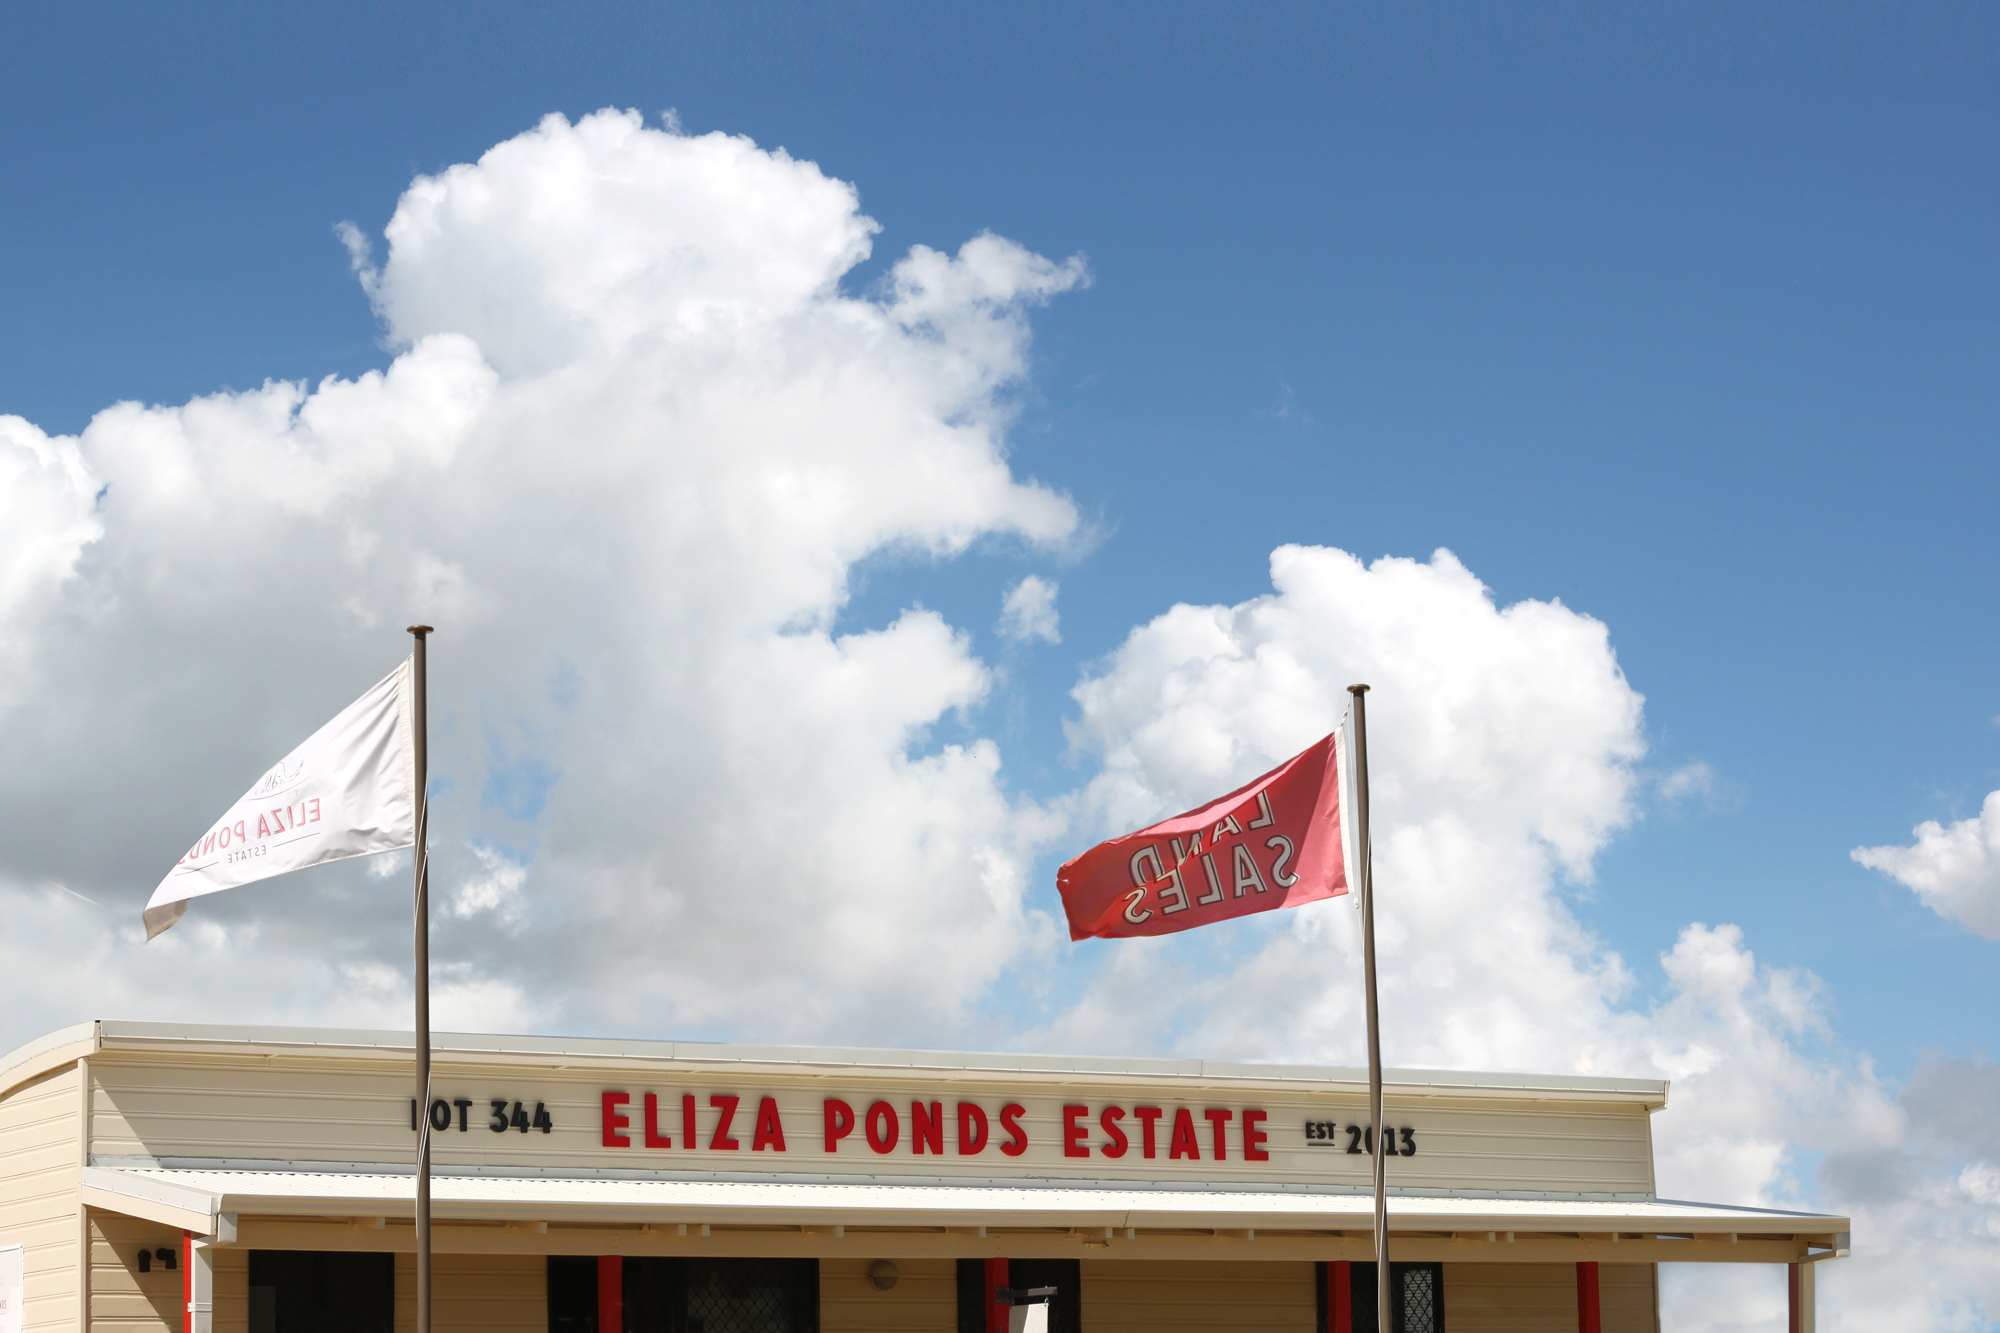 Eliza Ponds Signage 02.jpg